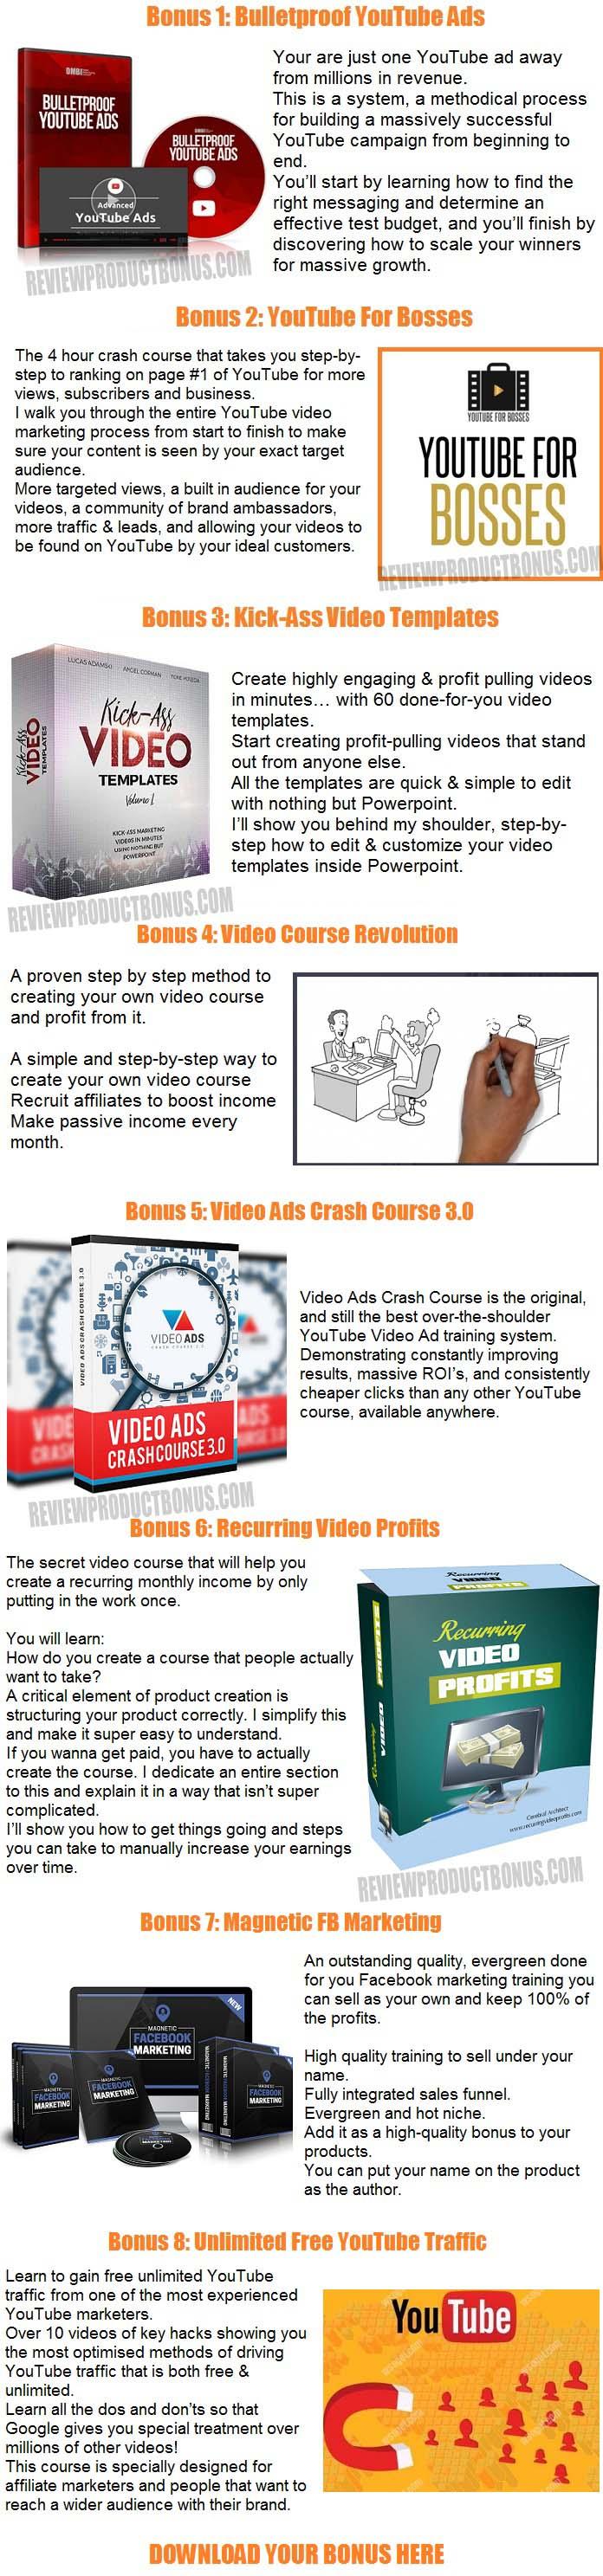 IM Video Ads Bonus